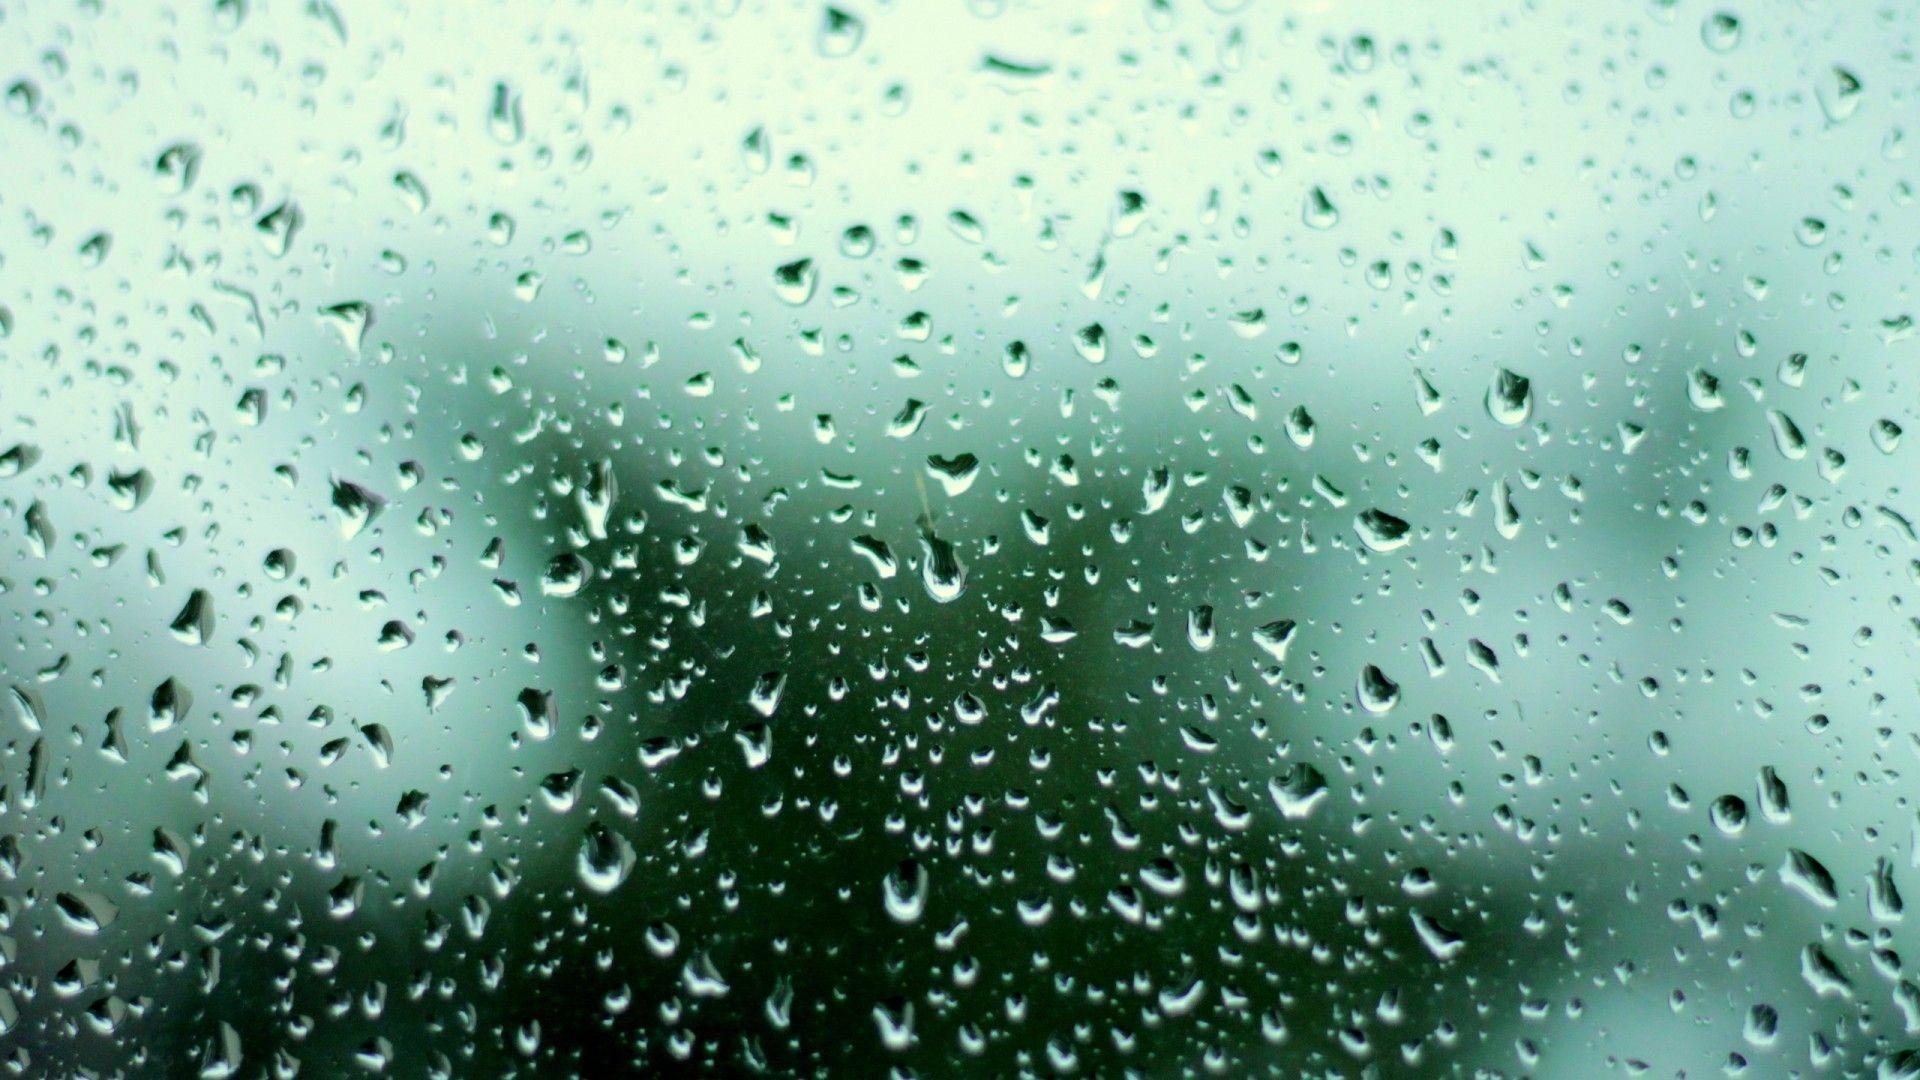 Spring Rain Desktop Wallpaper